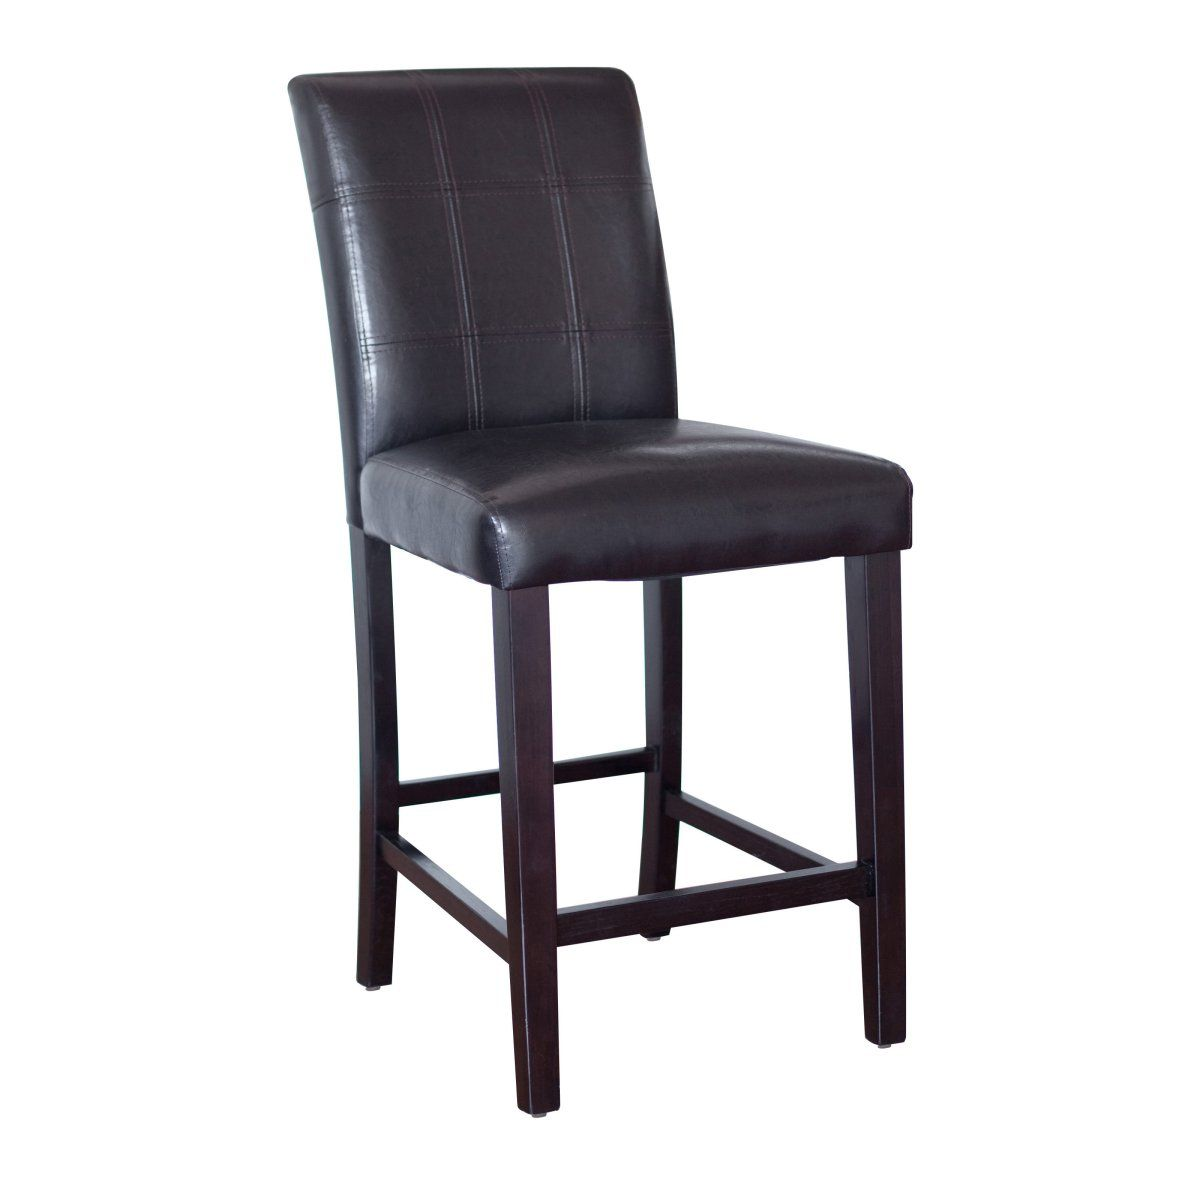 Fantastic 90 28 H Palazzo Bar Stool Kitchen 30 Inch Bar Stools Short Links Chair Design For Home Short Linksinfo